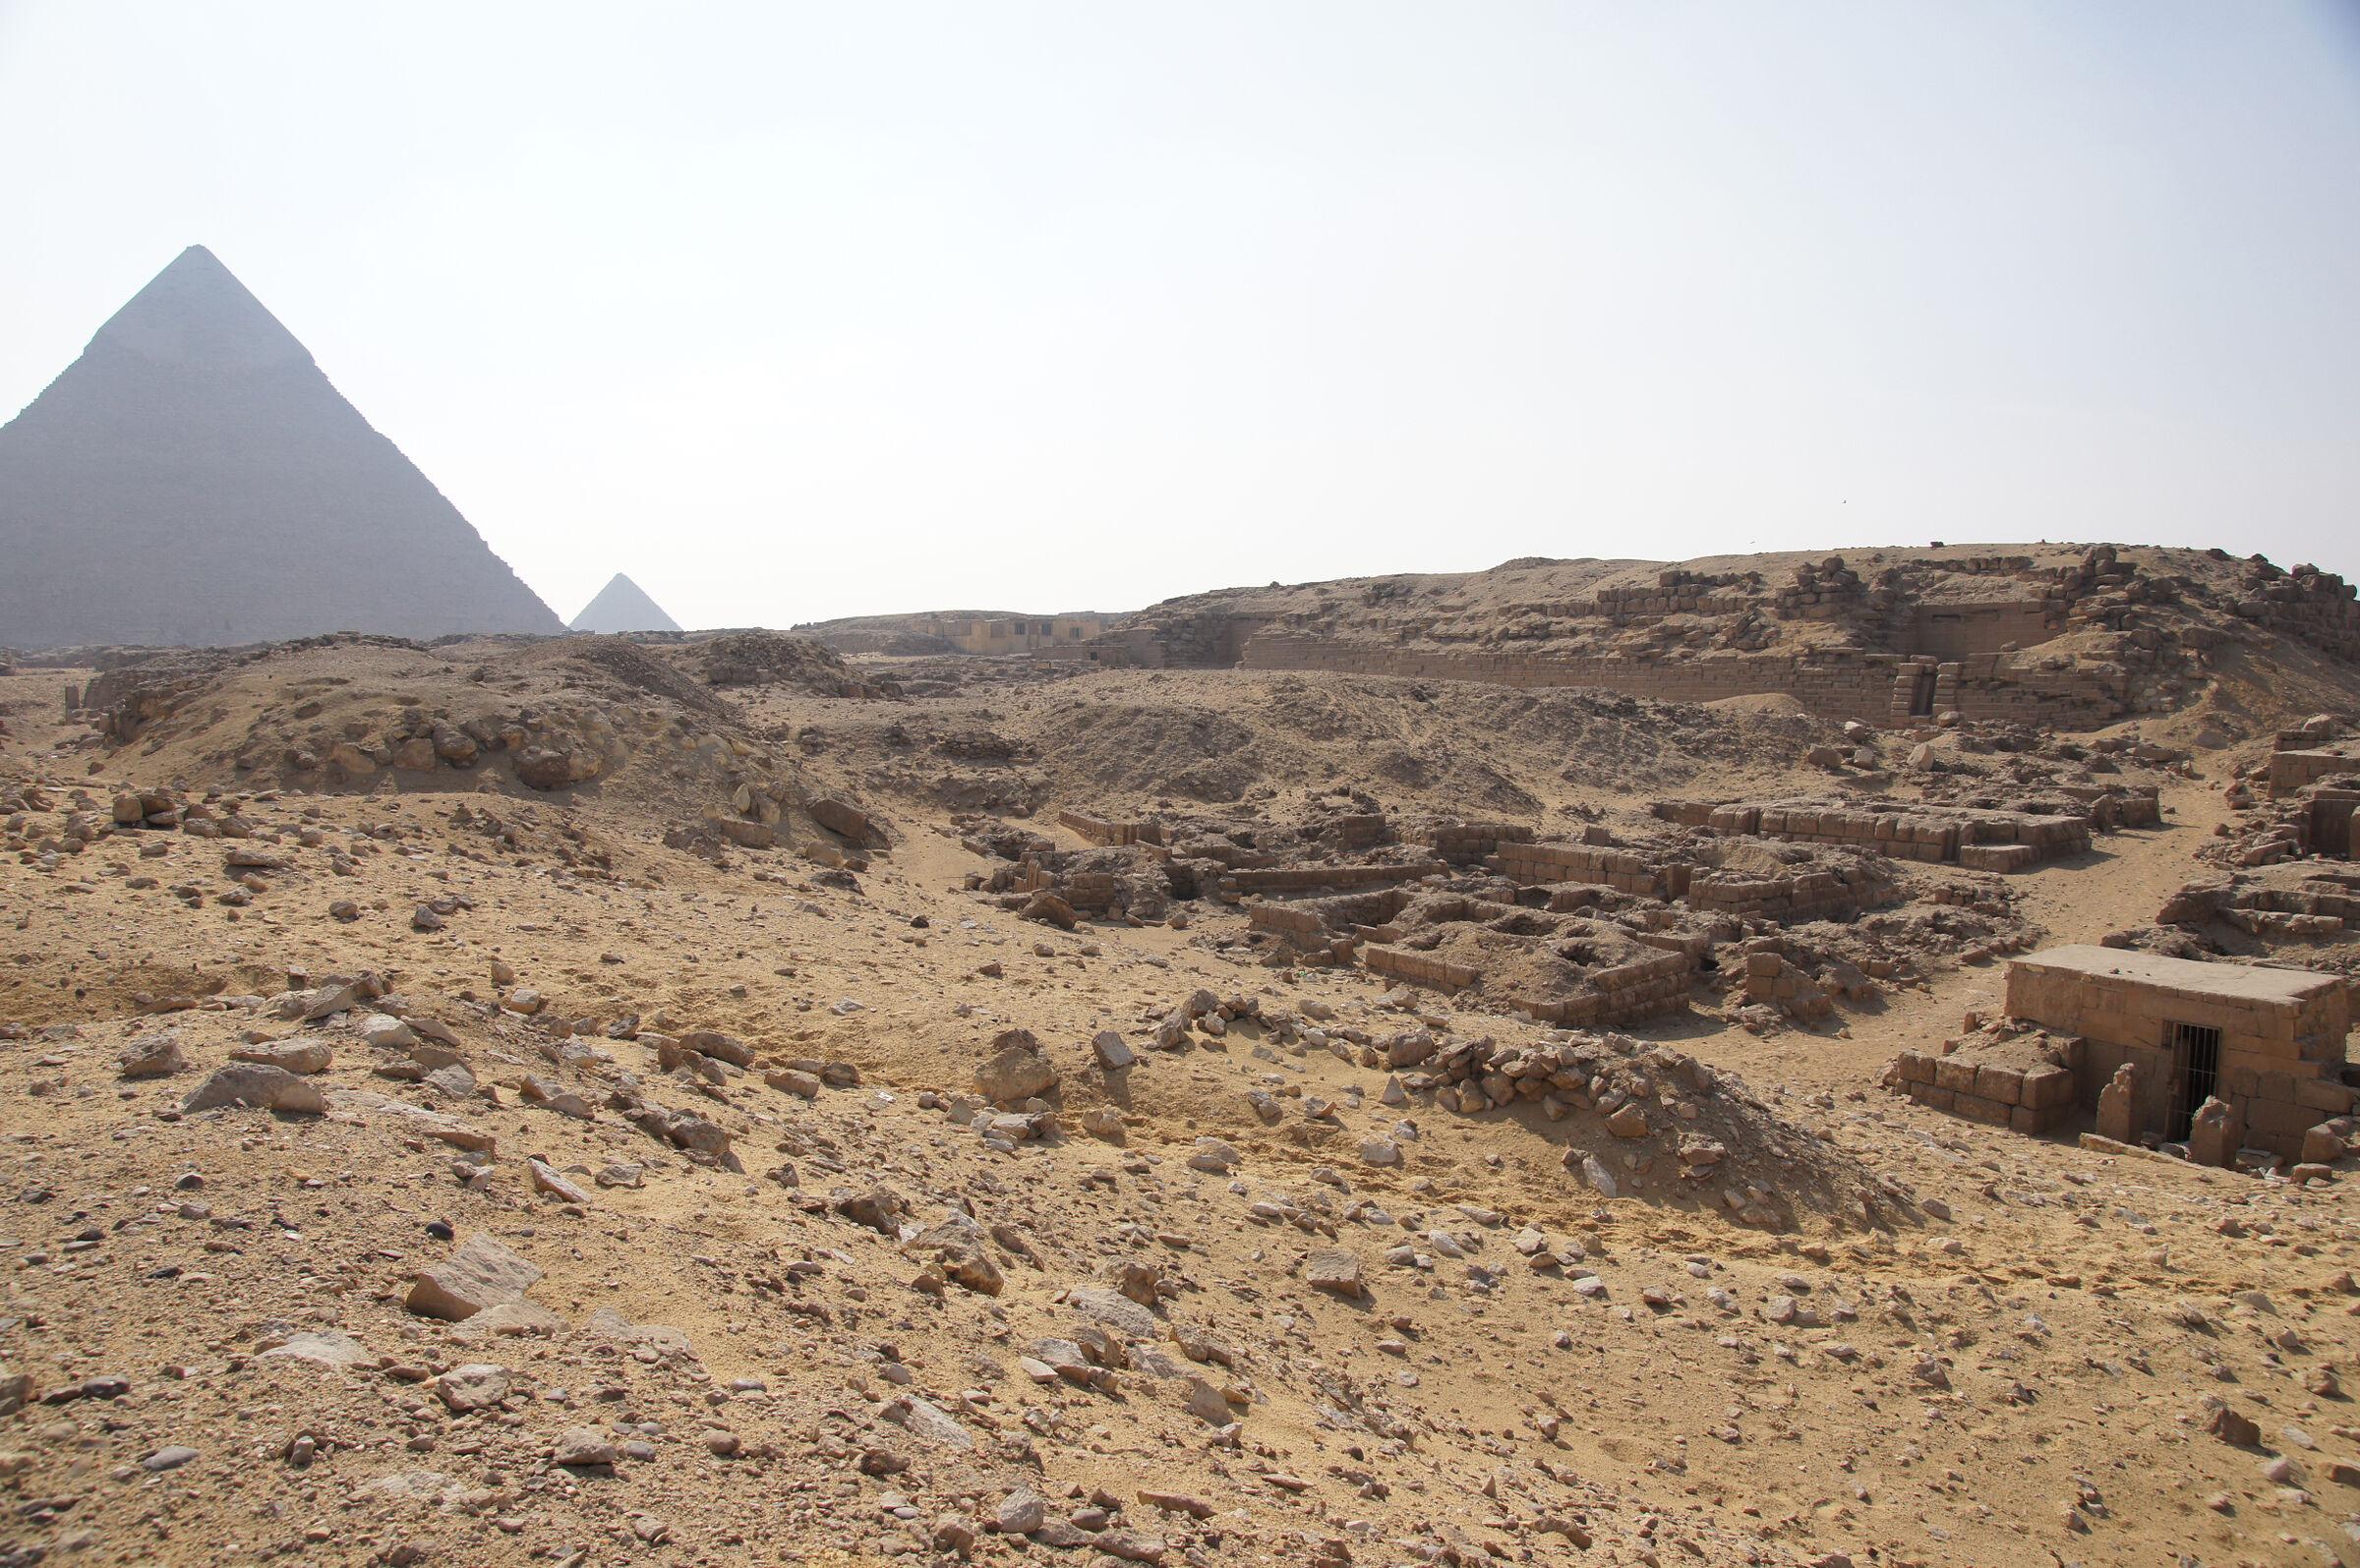 Western Cemetery: Site: Giza; View:  G 2240, G 2246, G 2243, G 2244, G 2239, G 2242, G 2241, G 2238, G 2233, G 2237, G 2232, G 2236, G 2235, G 2234, G 2061, G 2071, G 2072, Khafre Pyramid, Menkaure Pyramid